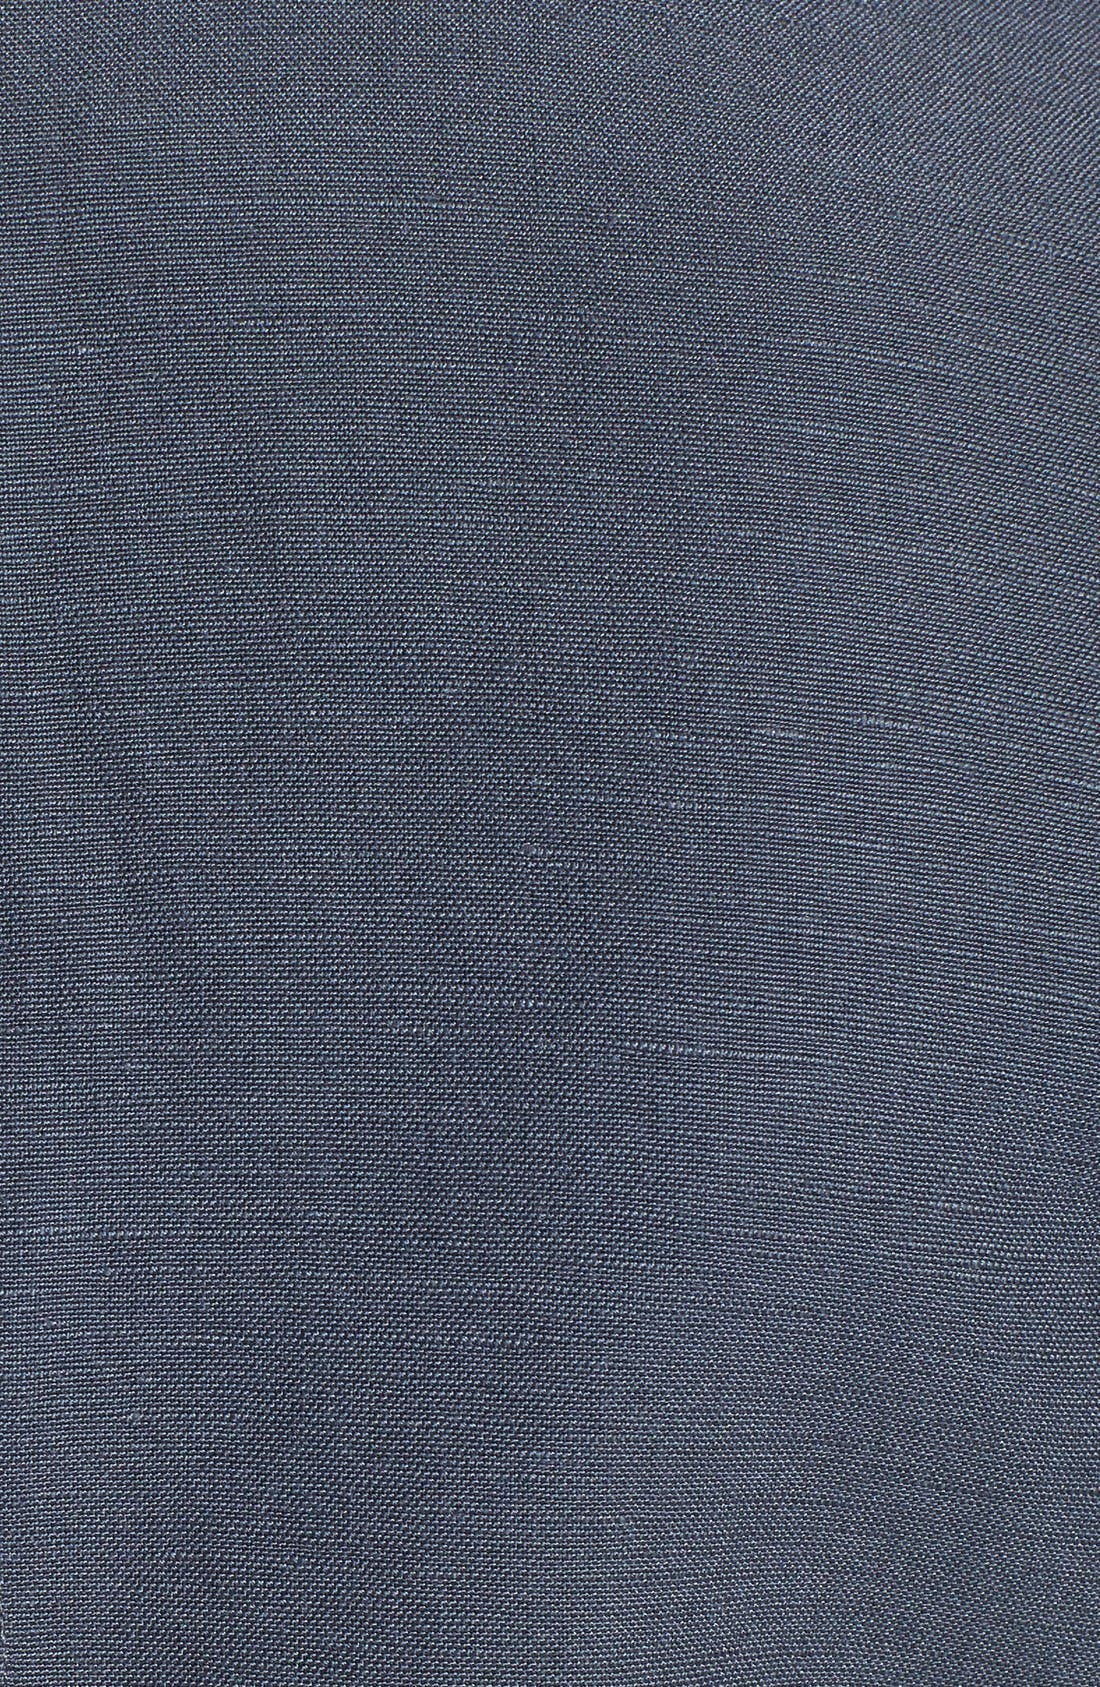 Linen Blend Jacket,                             Alternate thumbnail 3, color,                             030